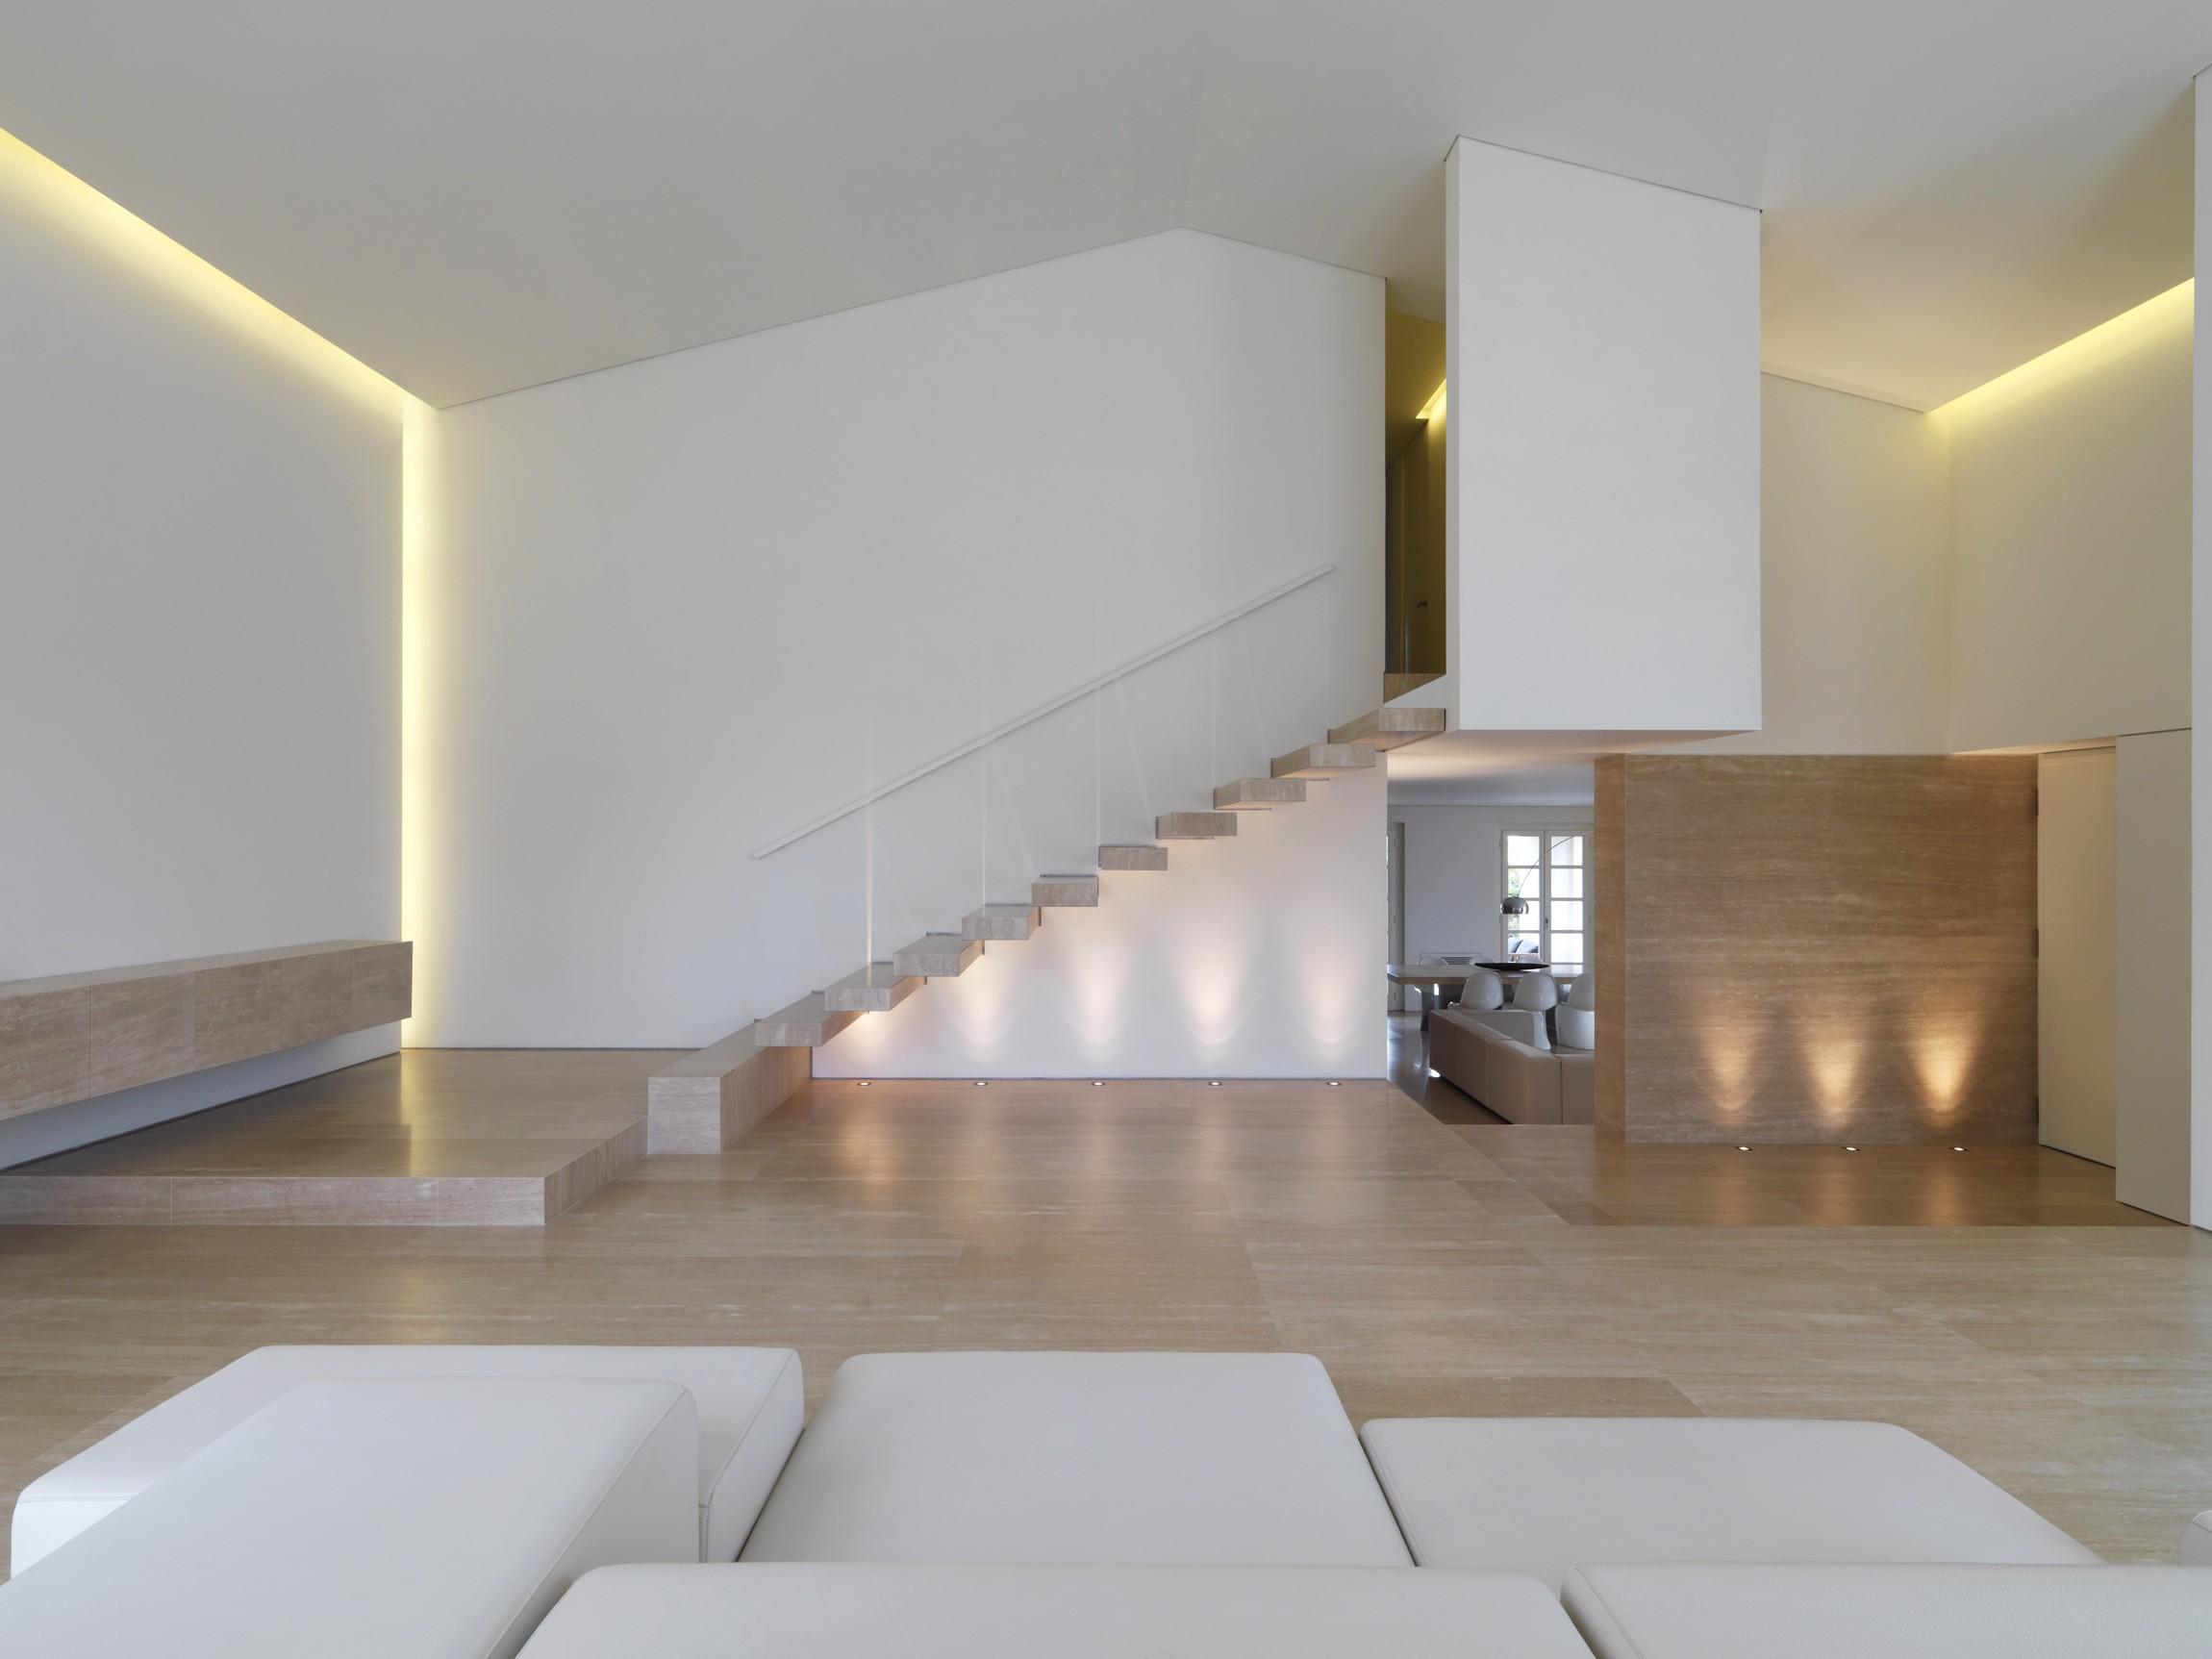 A house in tuscany 0 architect victor vasilev architect